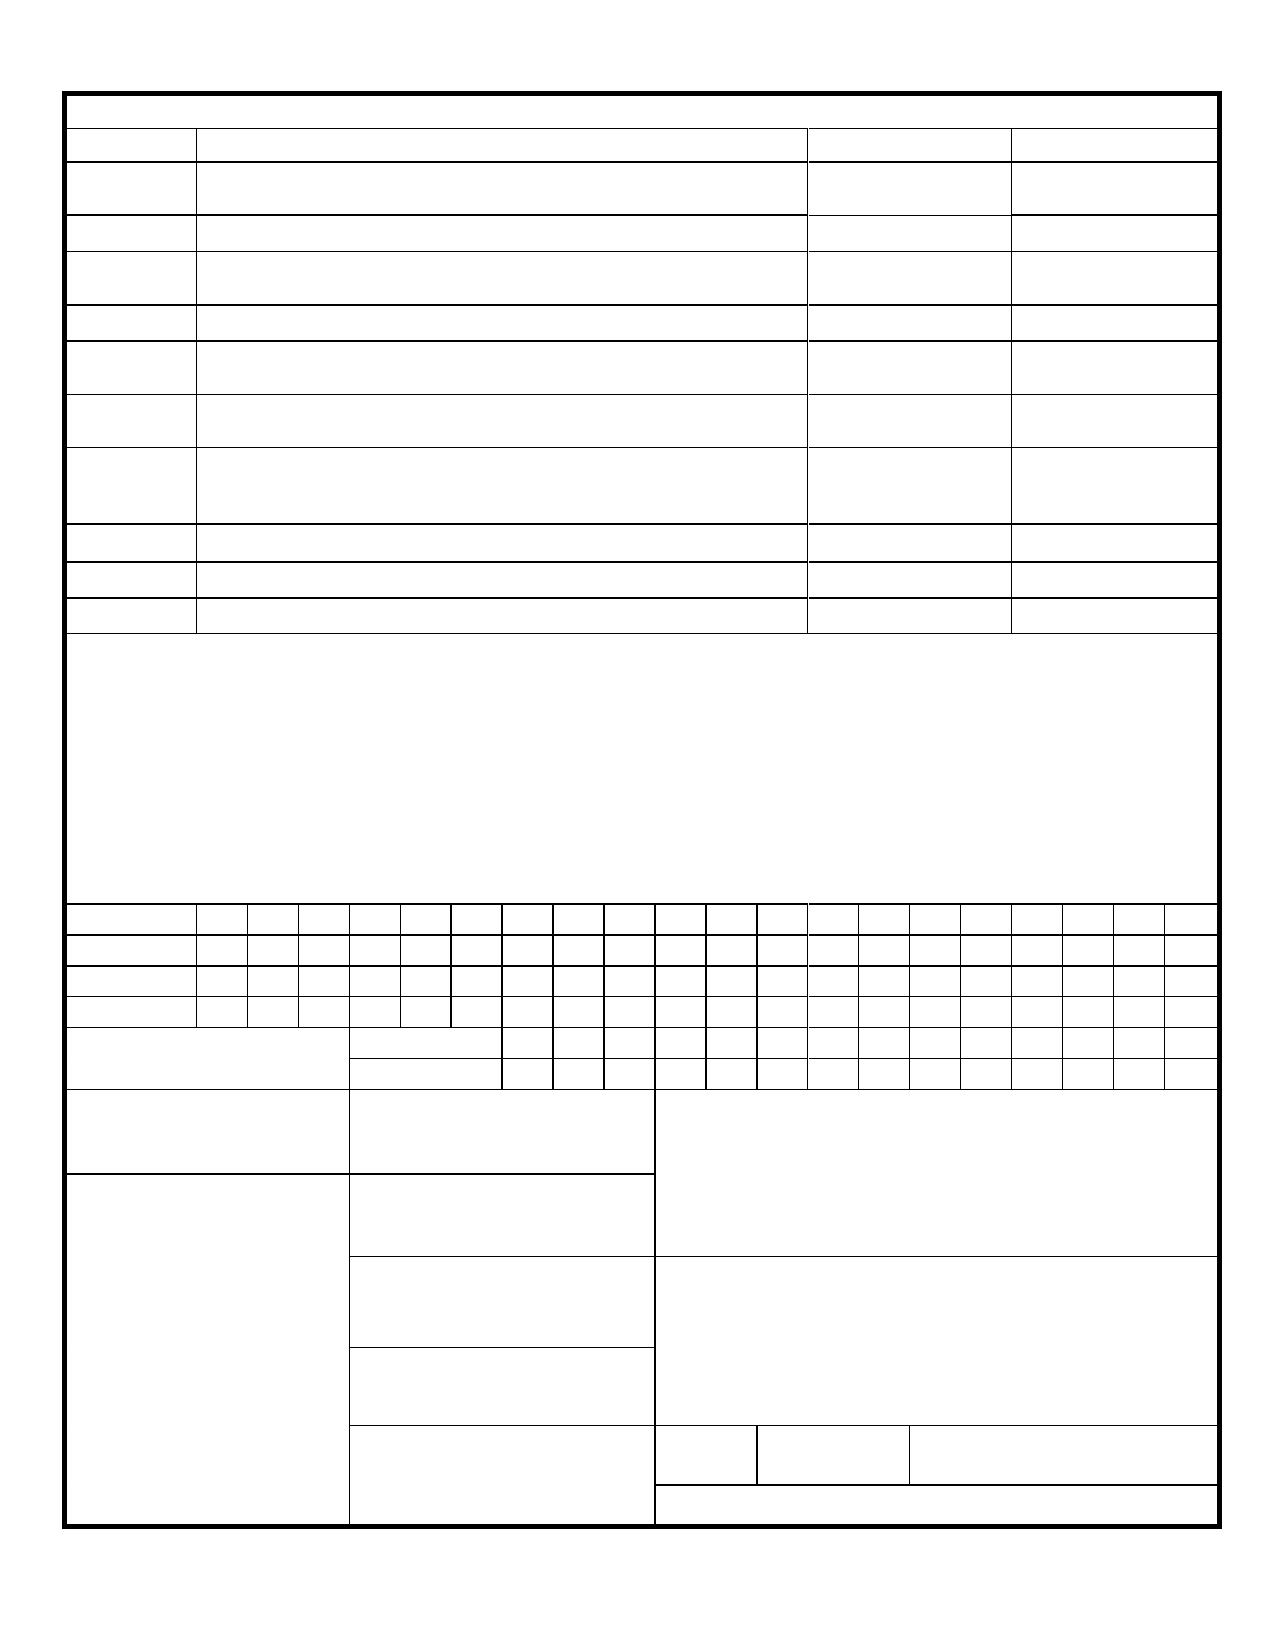 78003xx دیتاشیت PDF